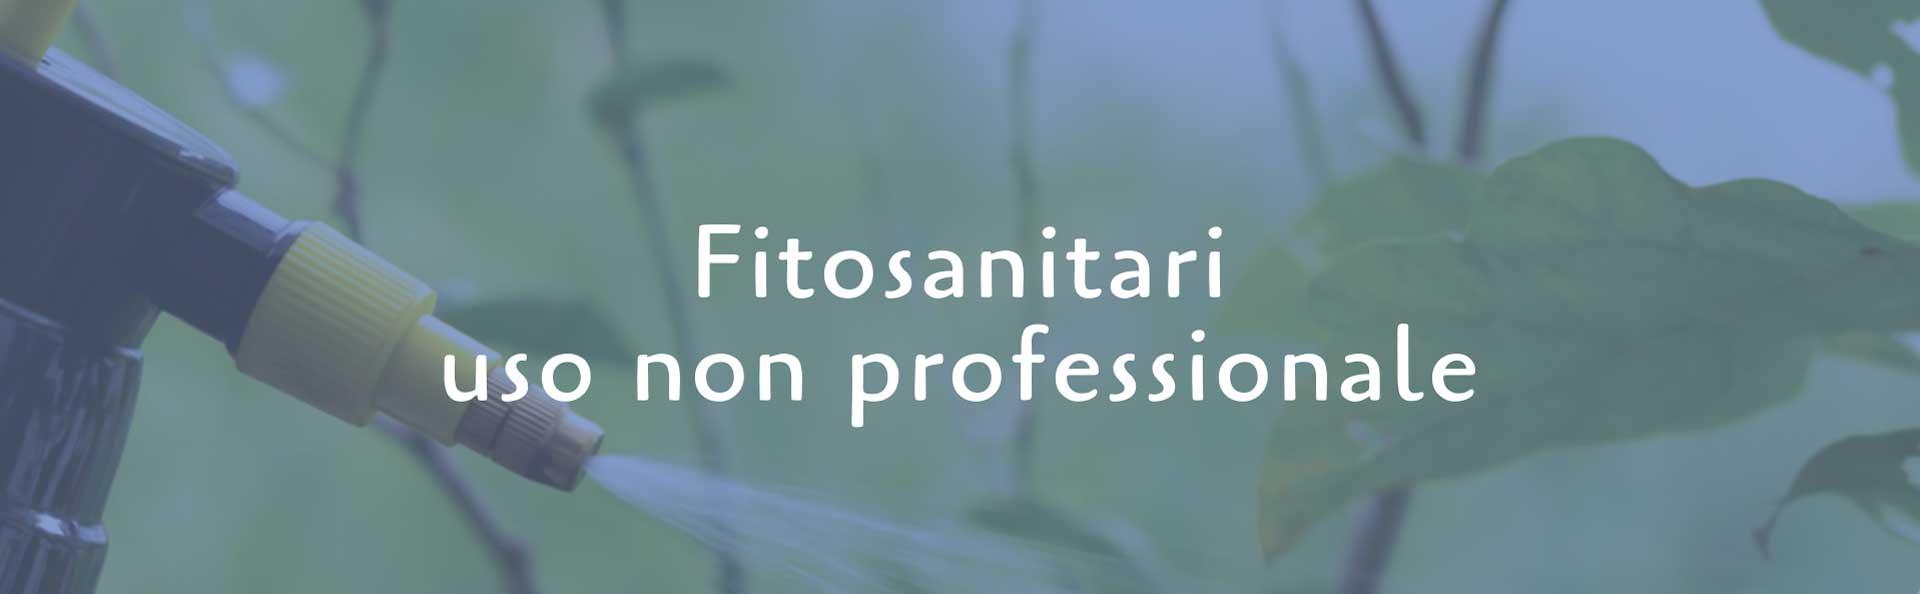 SEPRAN_fitosanitari-non-professionali_header